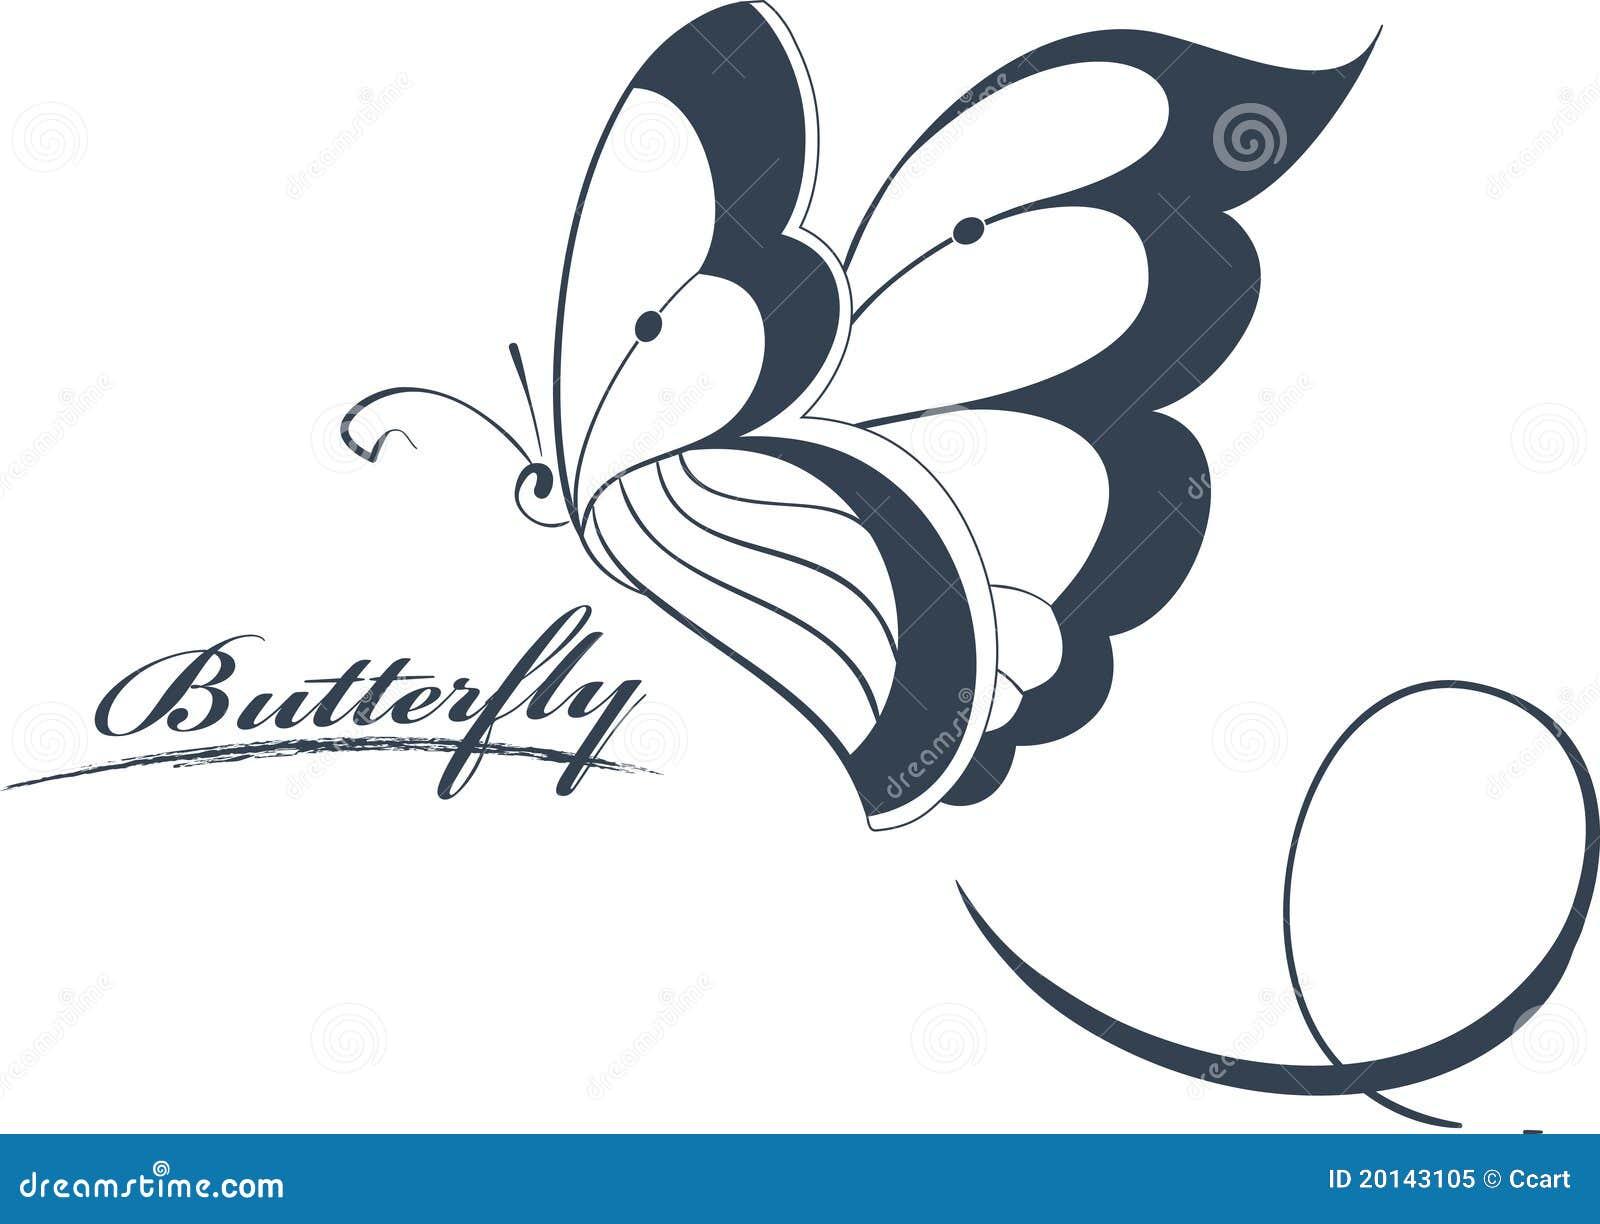 Butterfly Design Element stock vector. Illustration of